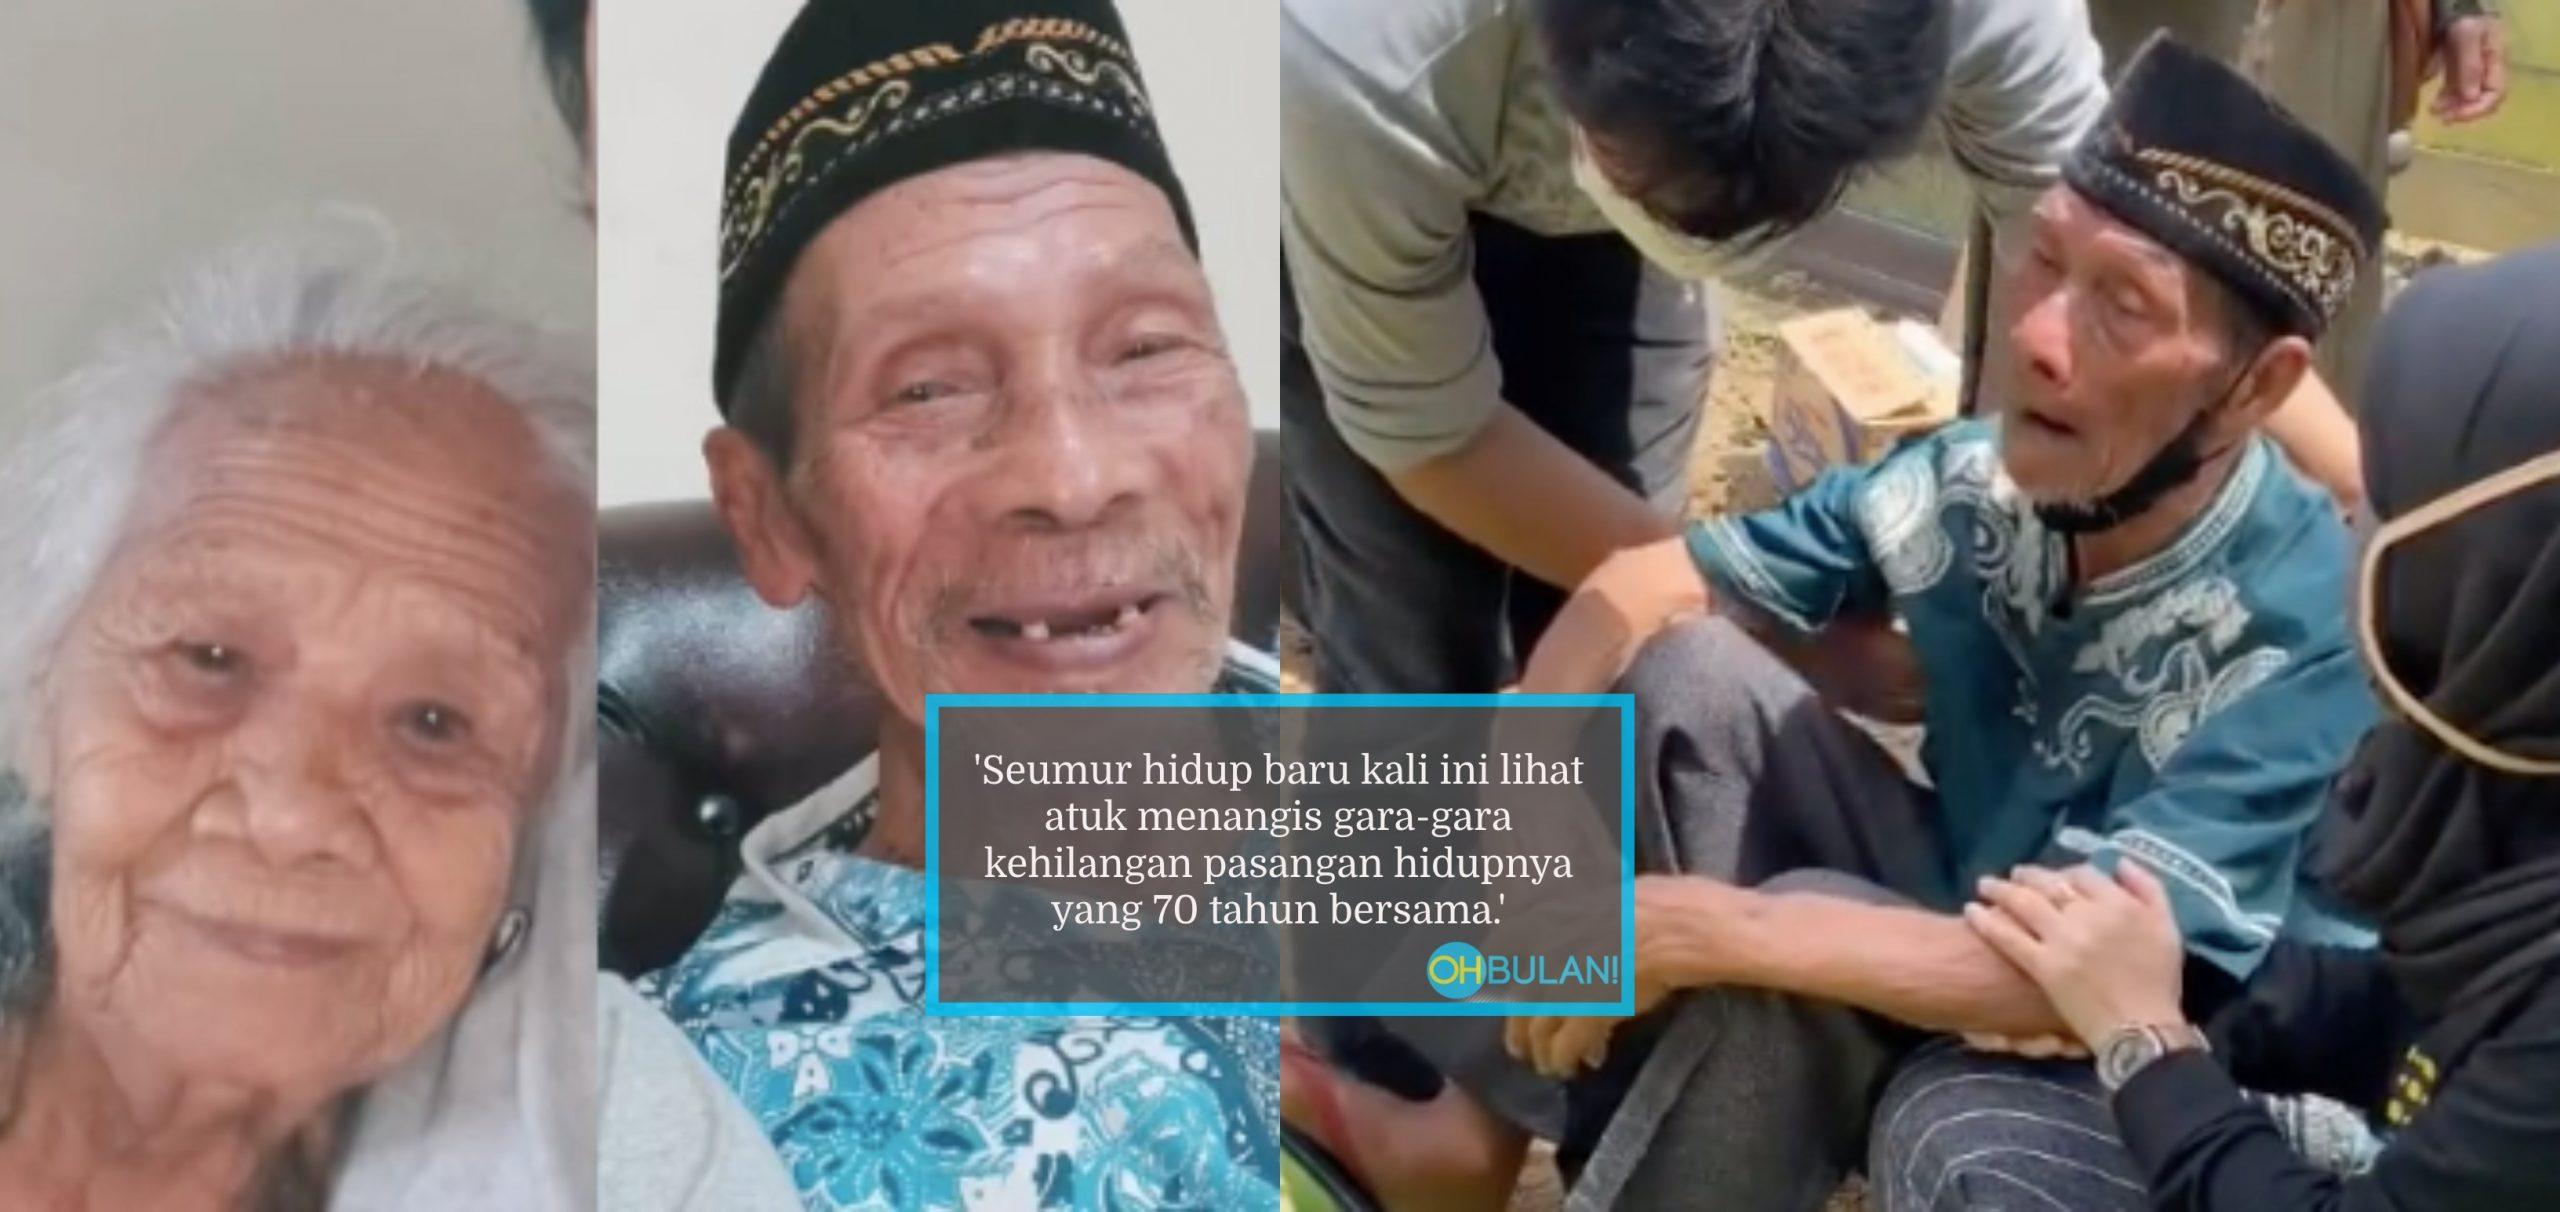 70 Tahun Hidup Bersama, Warga Emas Enggan Pulang Duduk Tepi Kubur Arwah Isteri